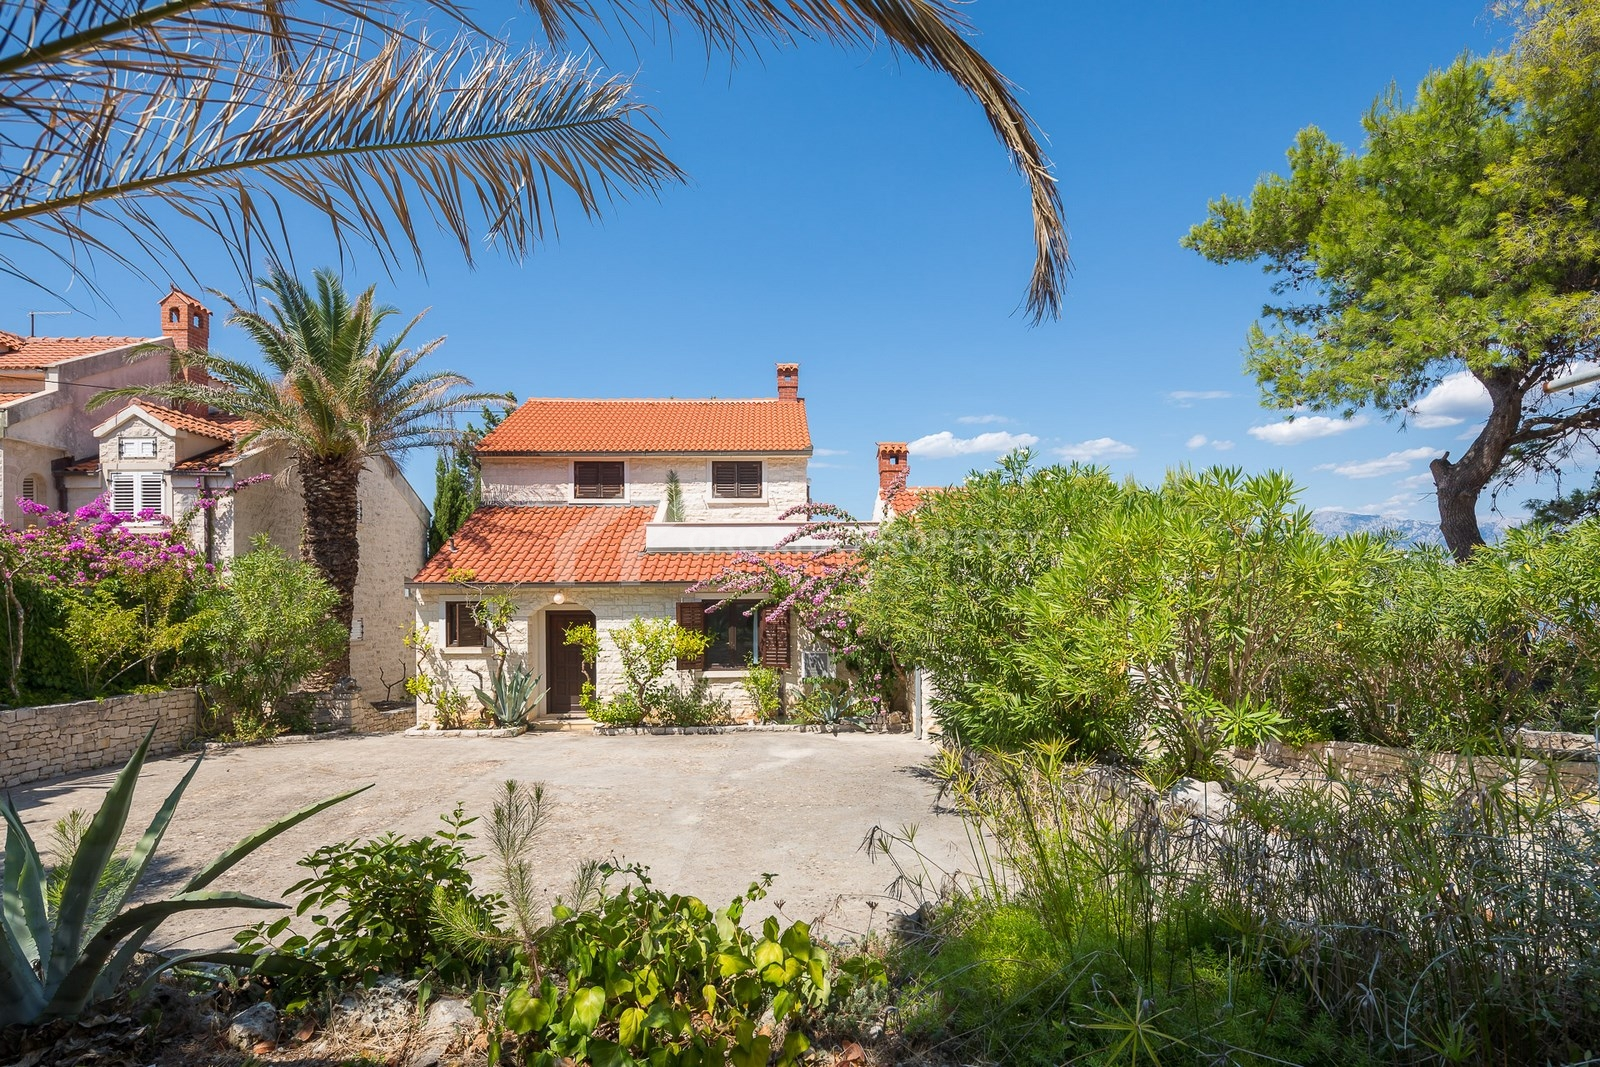 Sale of house in Splitska on the island of Brac